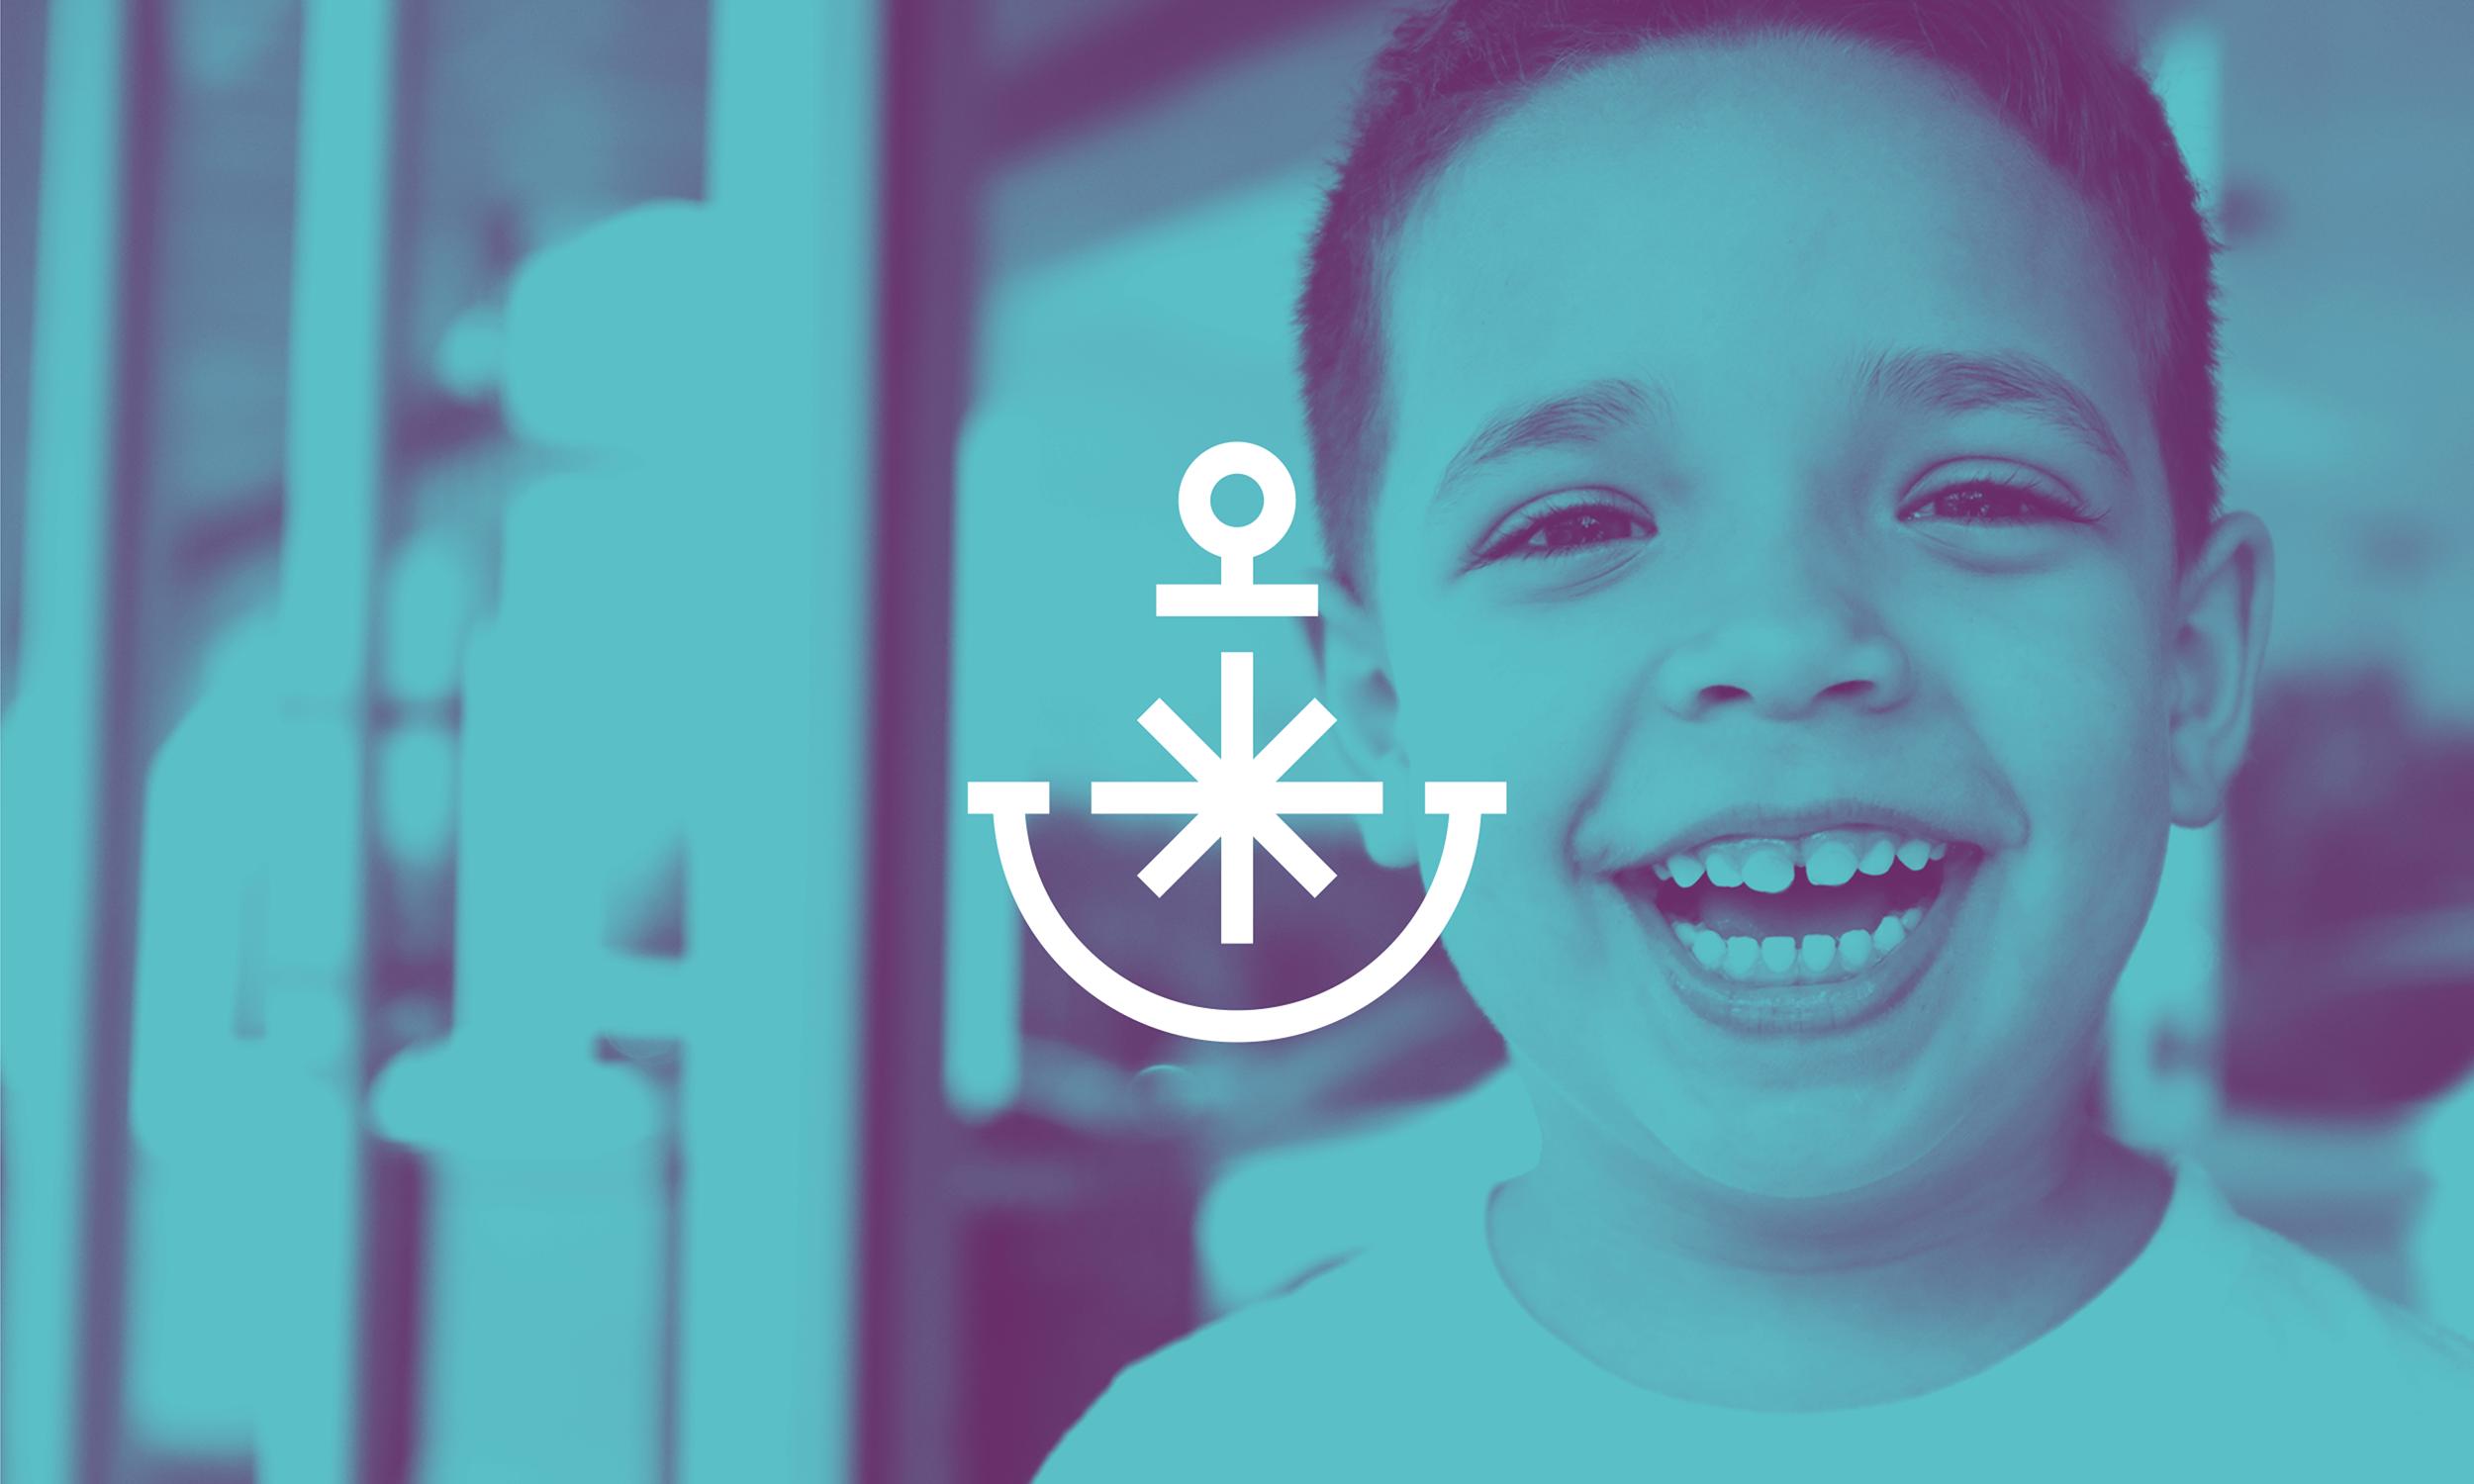 Capistrano-Childrens-Dentistry-Logo-Design-Freelance-Graphic-Designer-Margate-Kent-Presentation-Pediatric-Dental-Logo-2